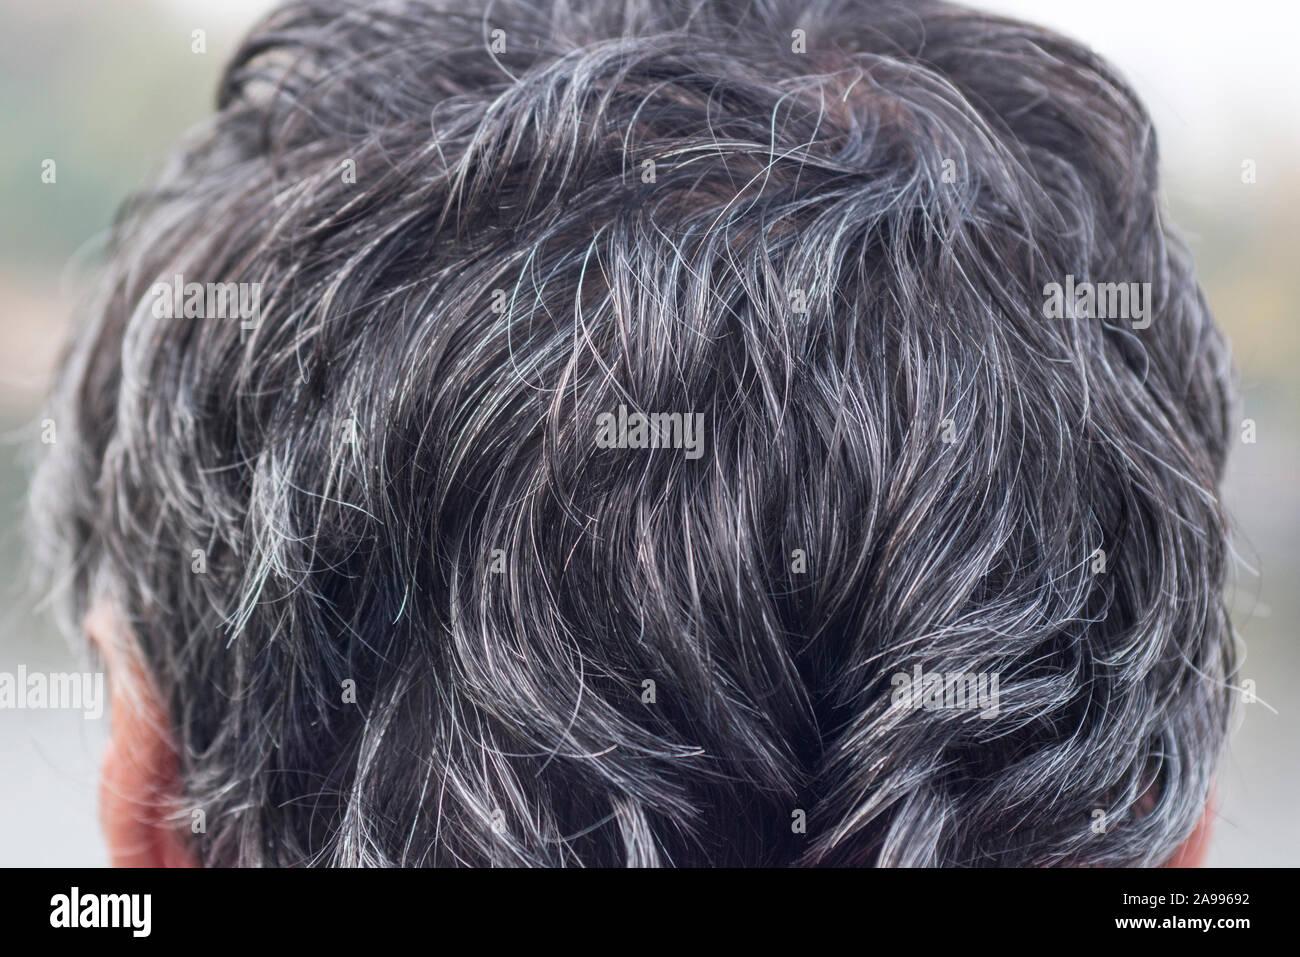 Grey Hair Gray Hair On The Head Backside Portrait Of Man Stock Photo Alamy